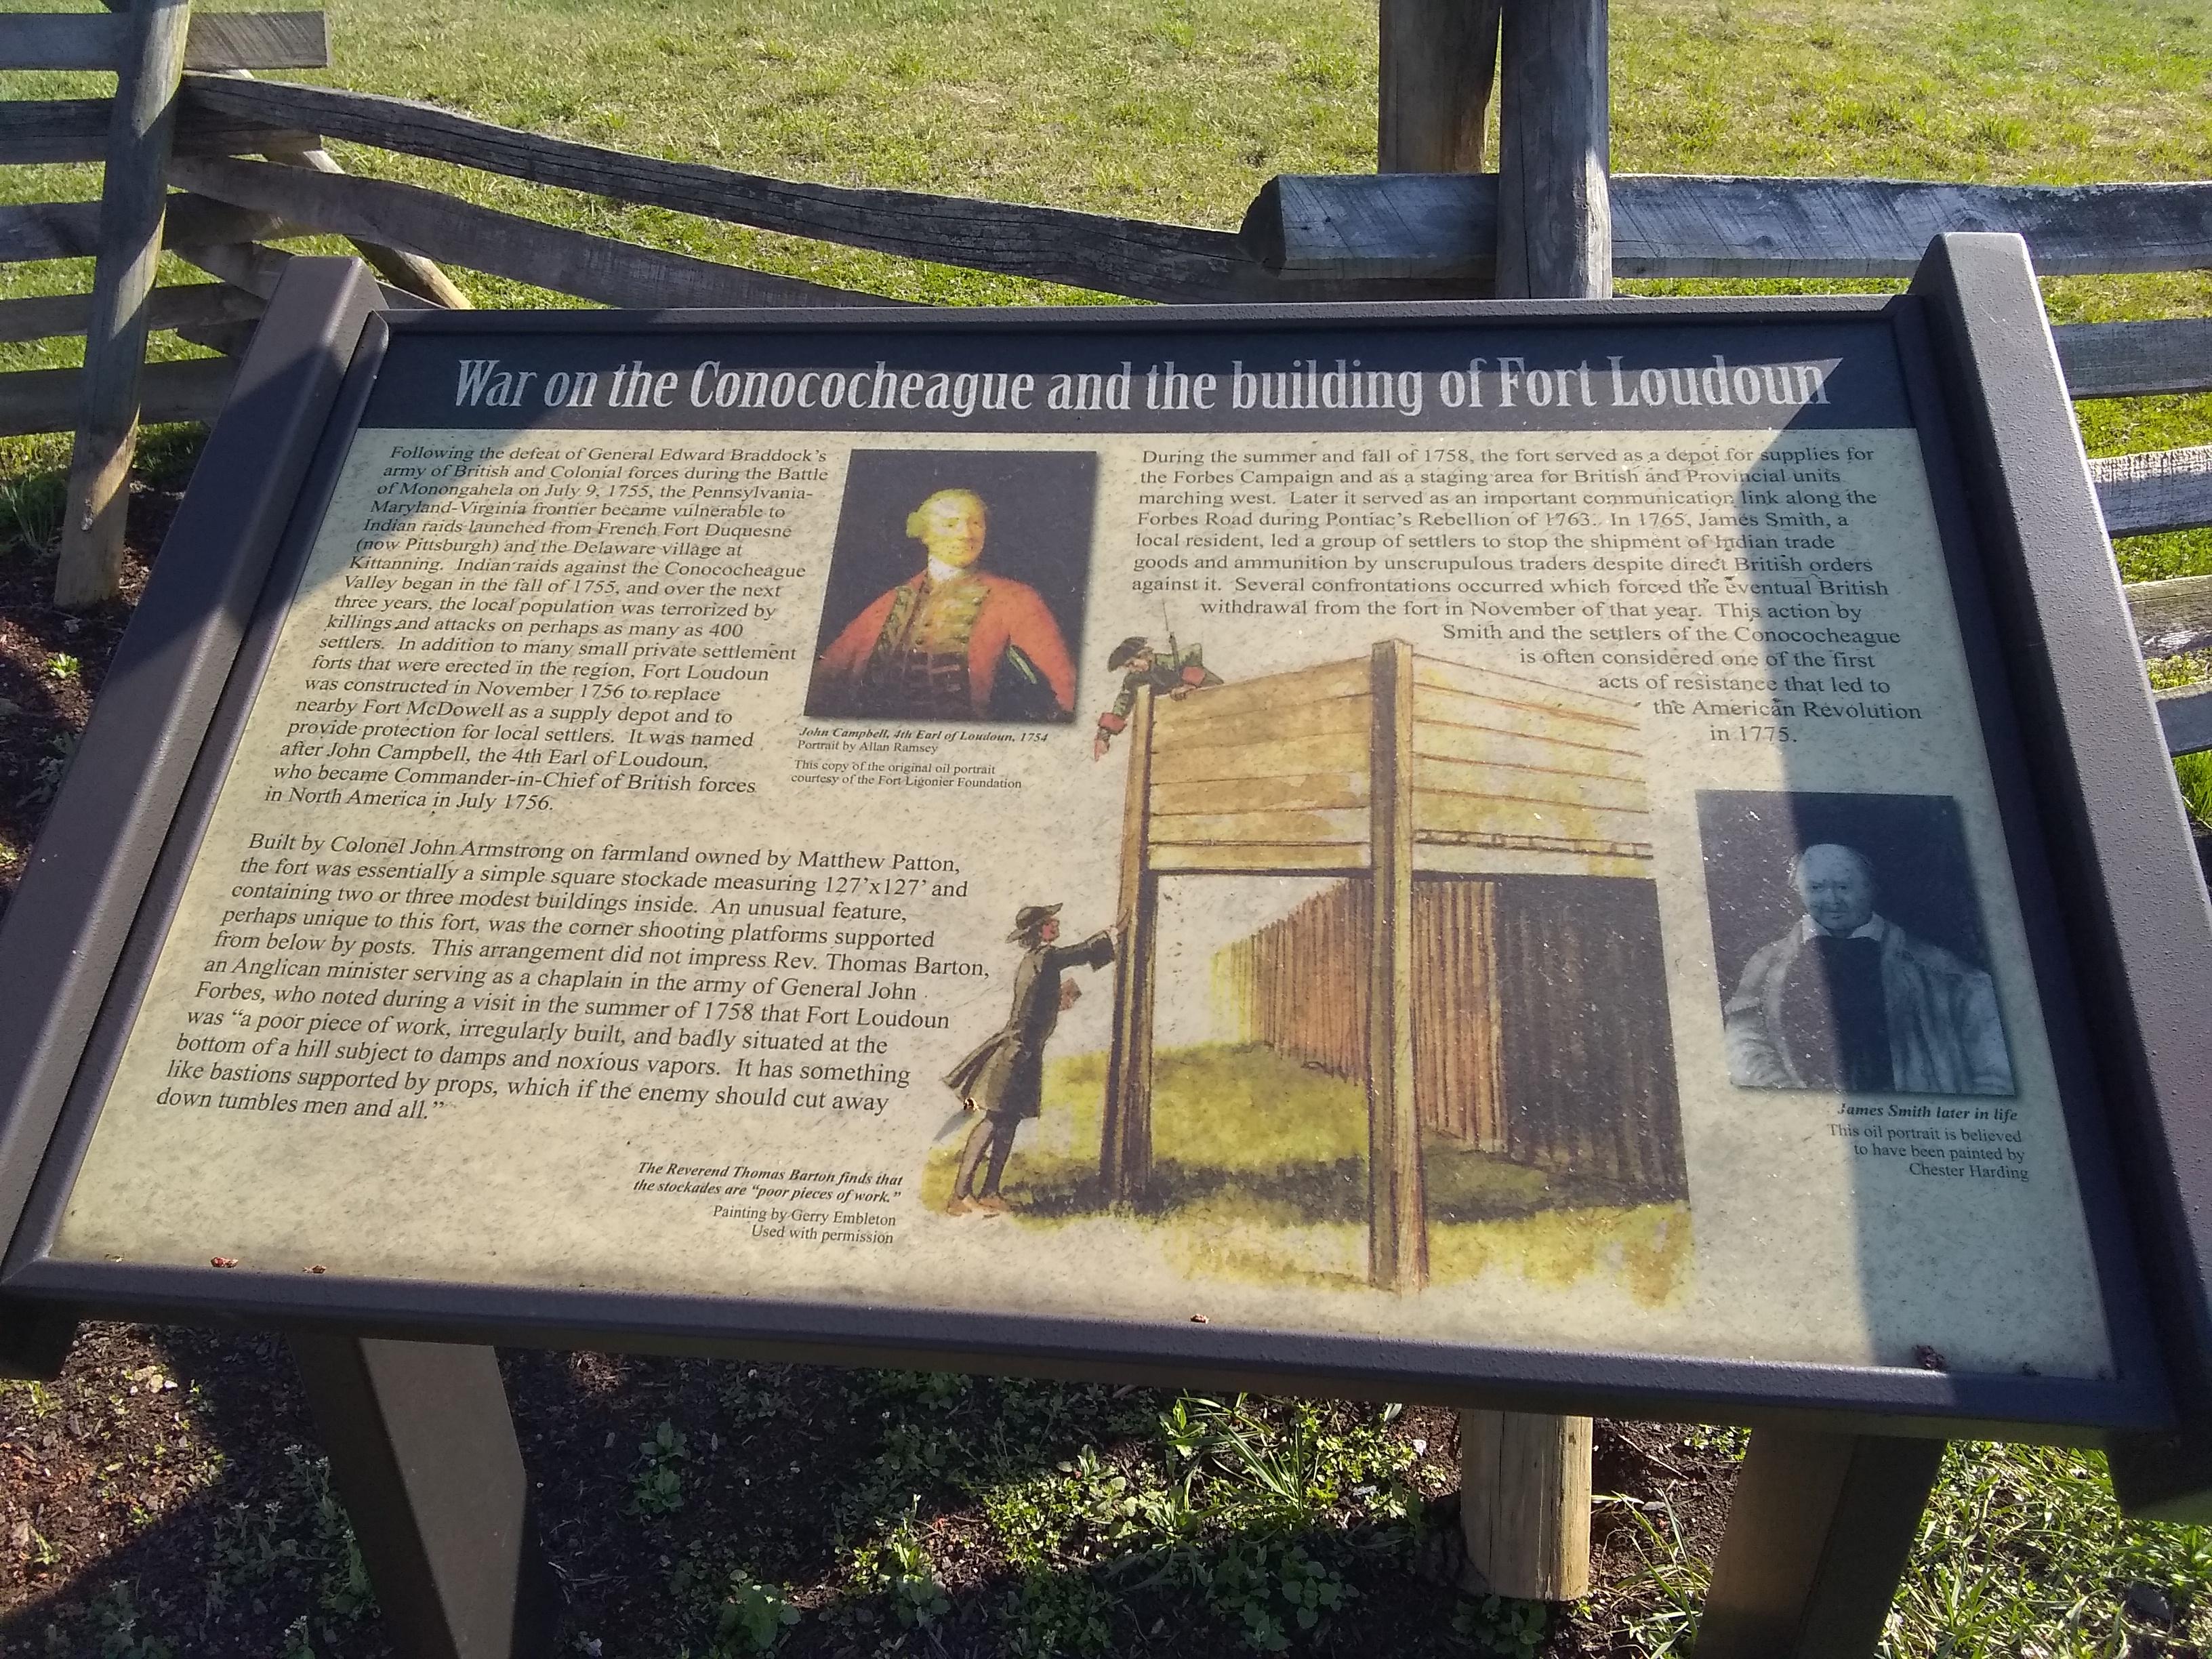 Plaque explaining the fort's construction